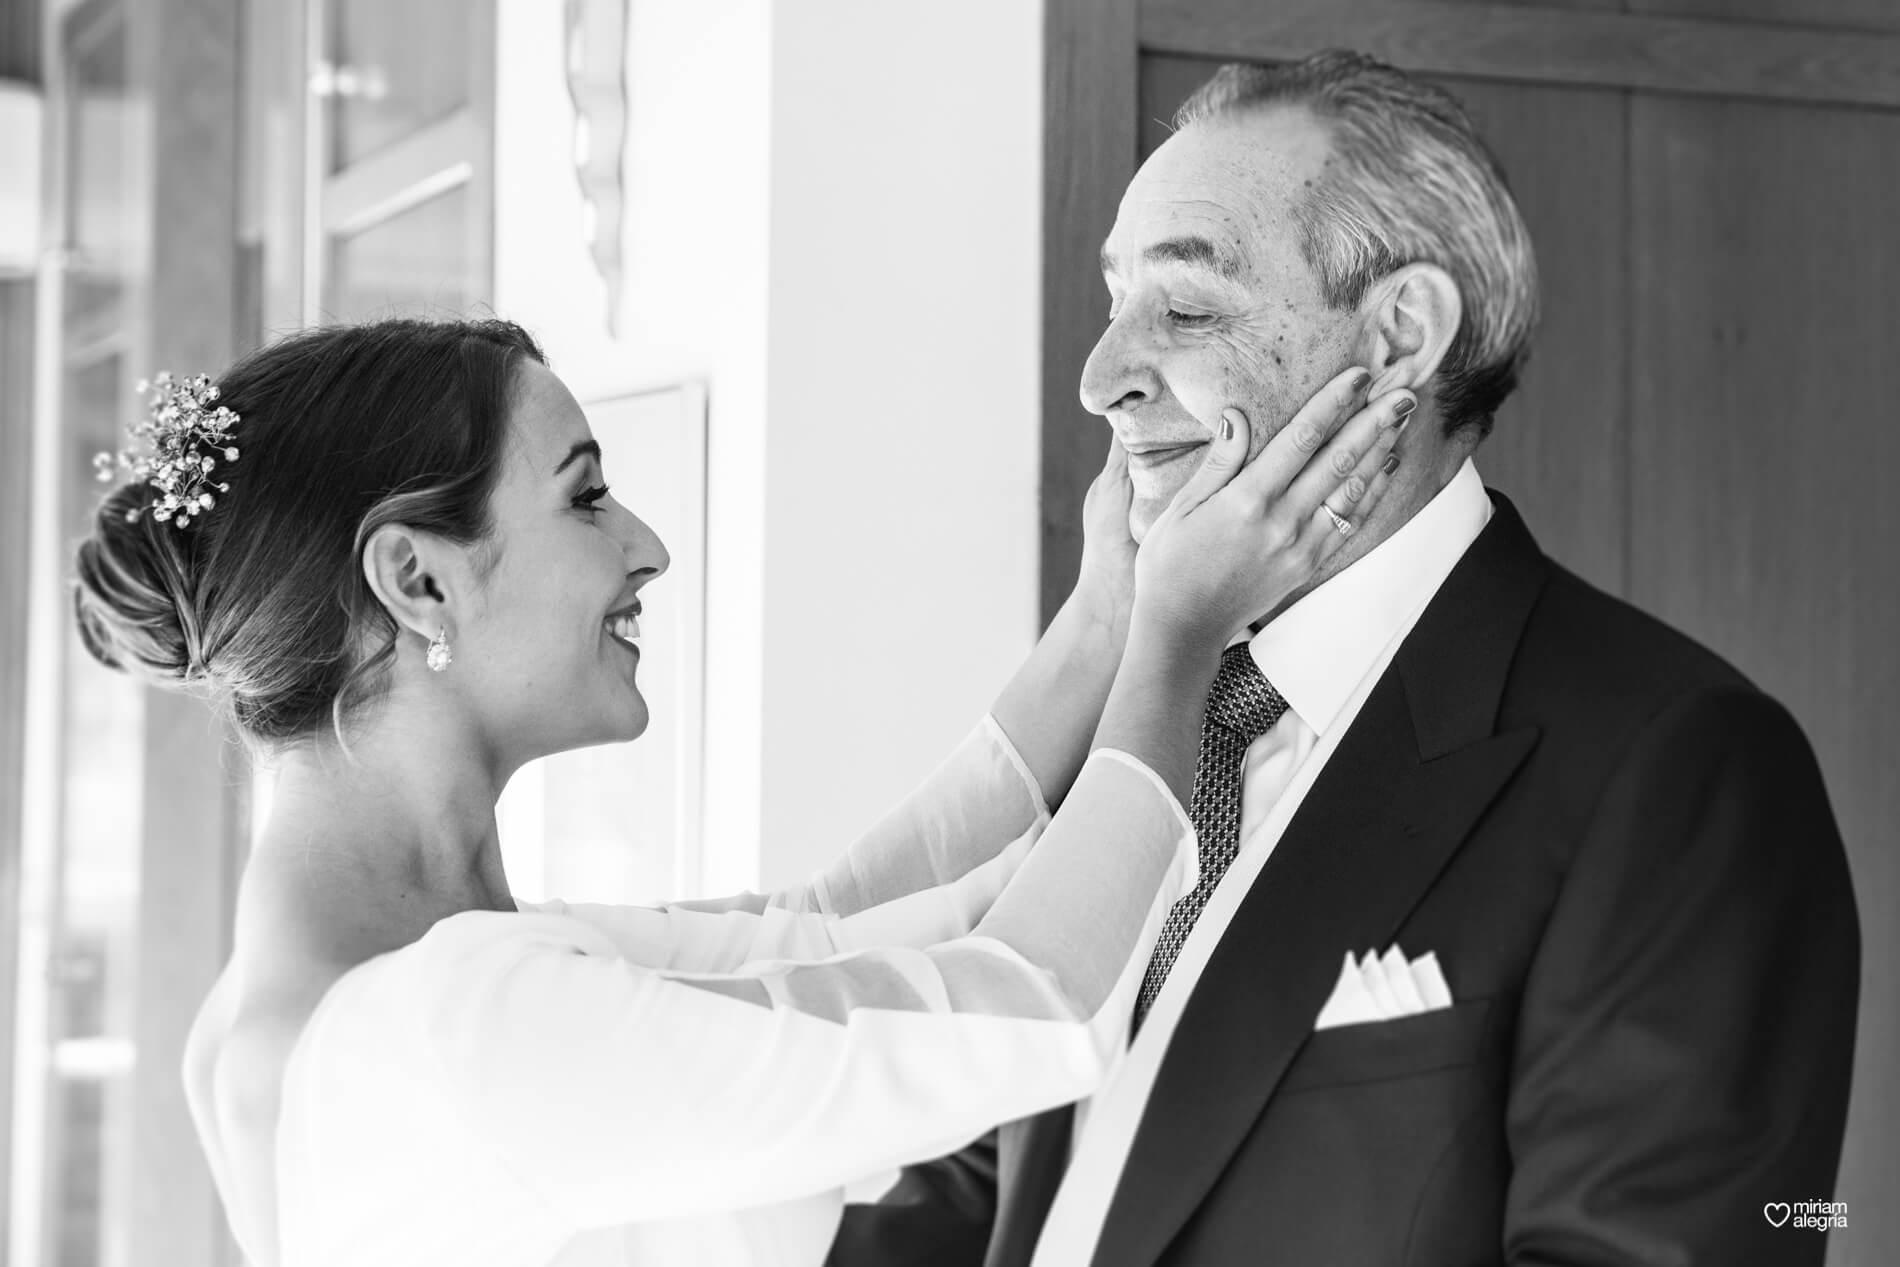 vestido-de-novia-paula-del-vas-miriam-alegria-fotografos-boda-murcia-28